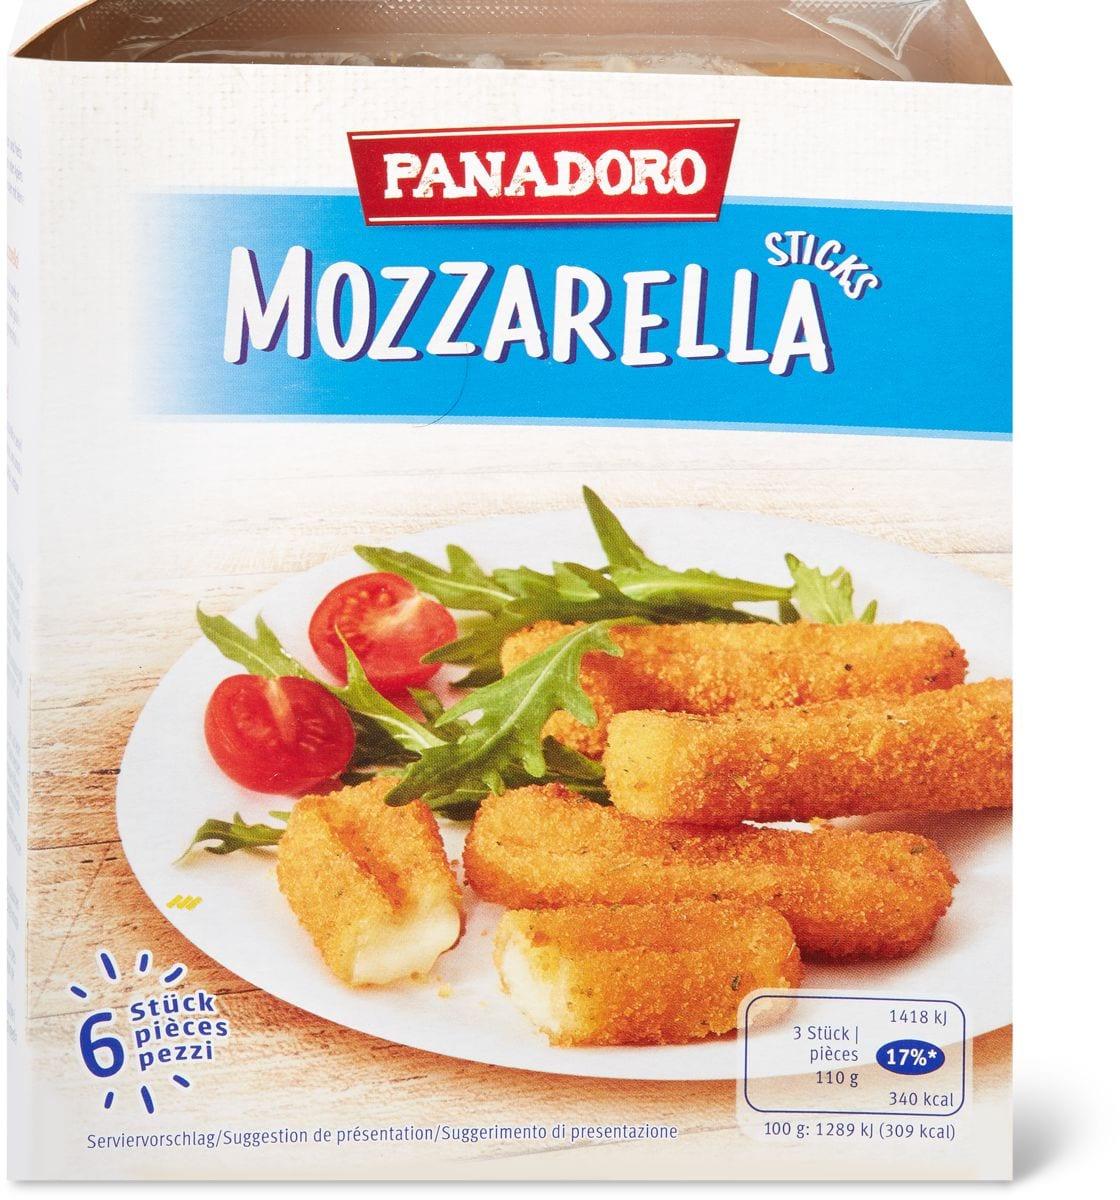 Panadoro Mozzarella Sticks